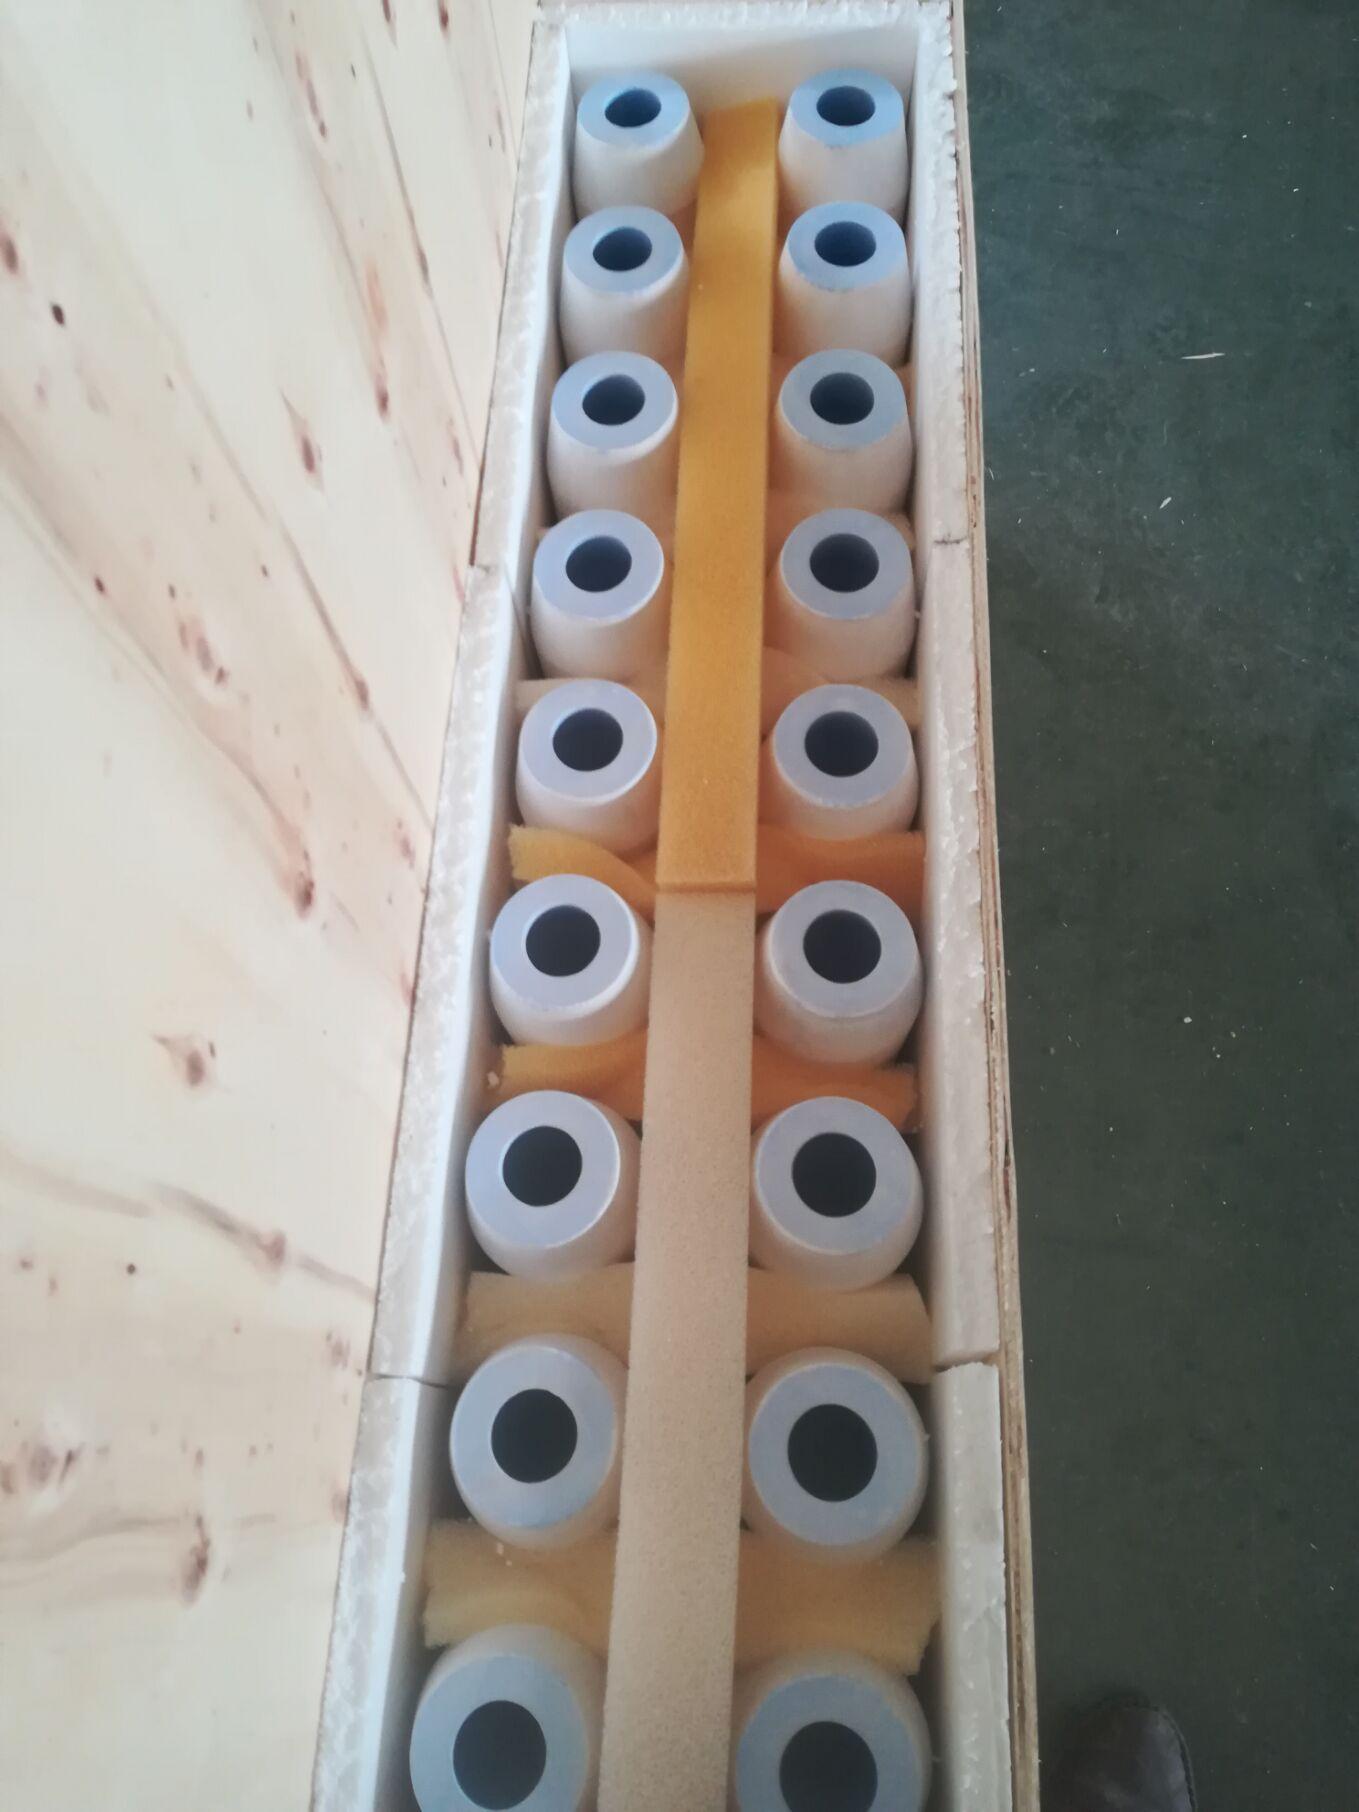 Tundish Upper Nozzles